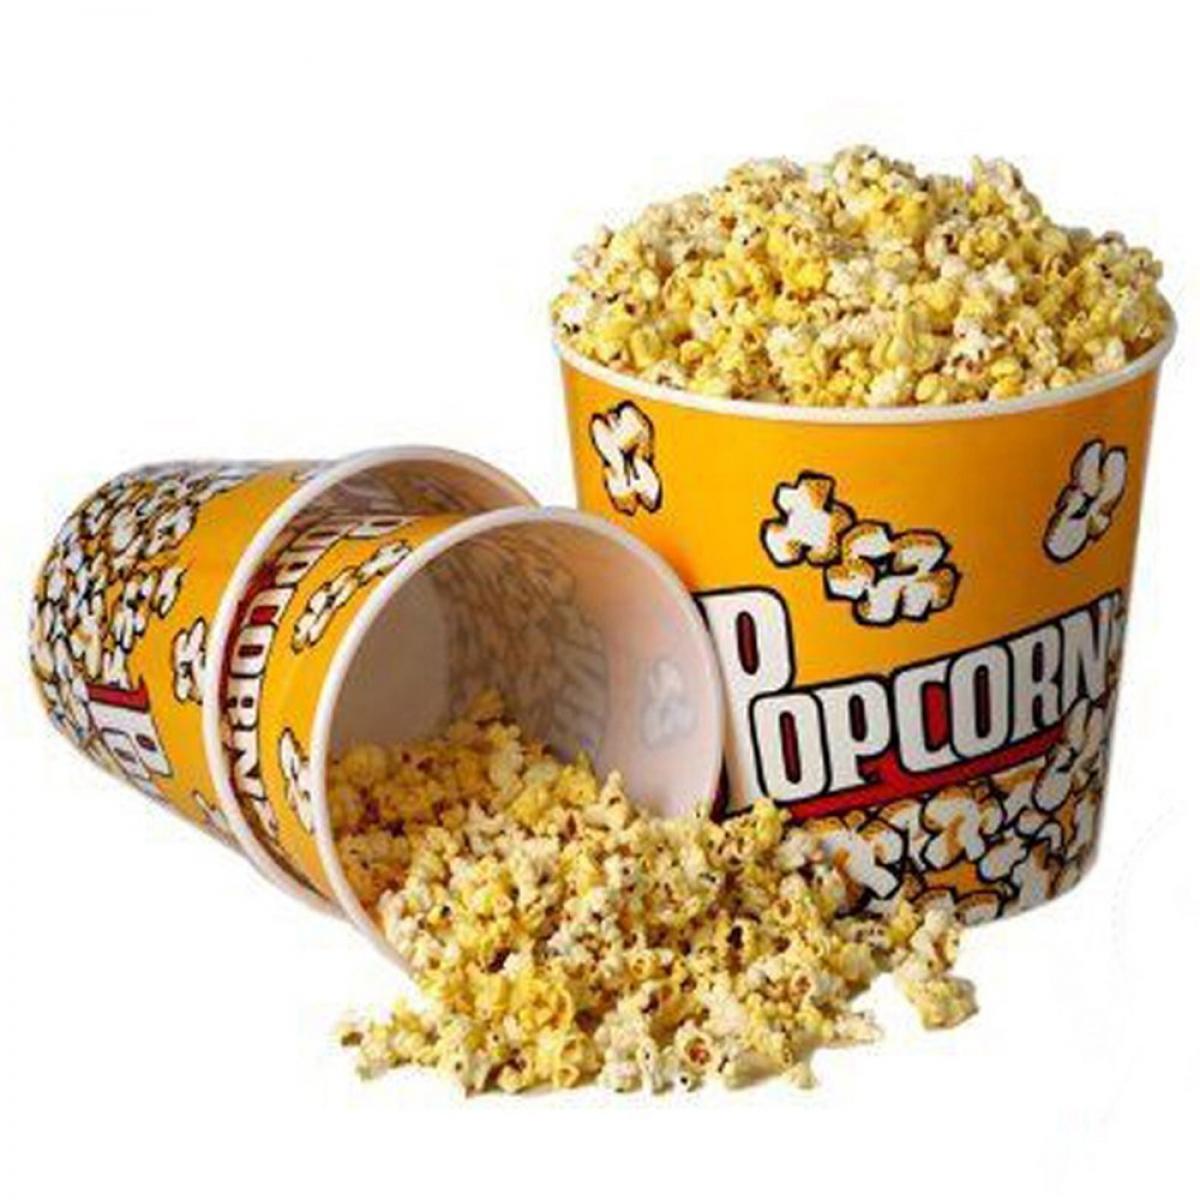 pop corn tub 32 oz / 115*140